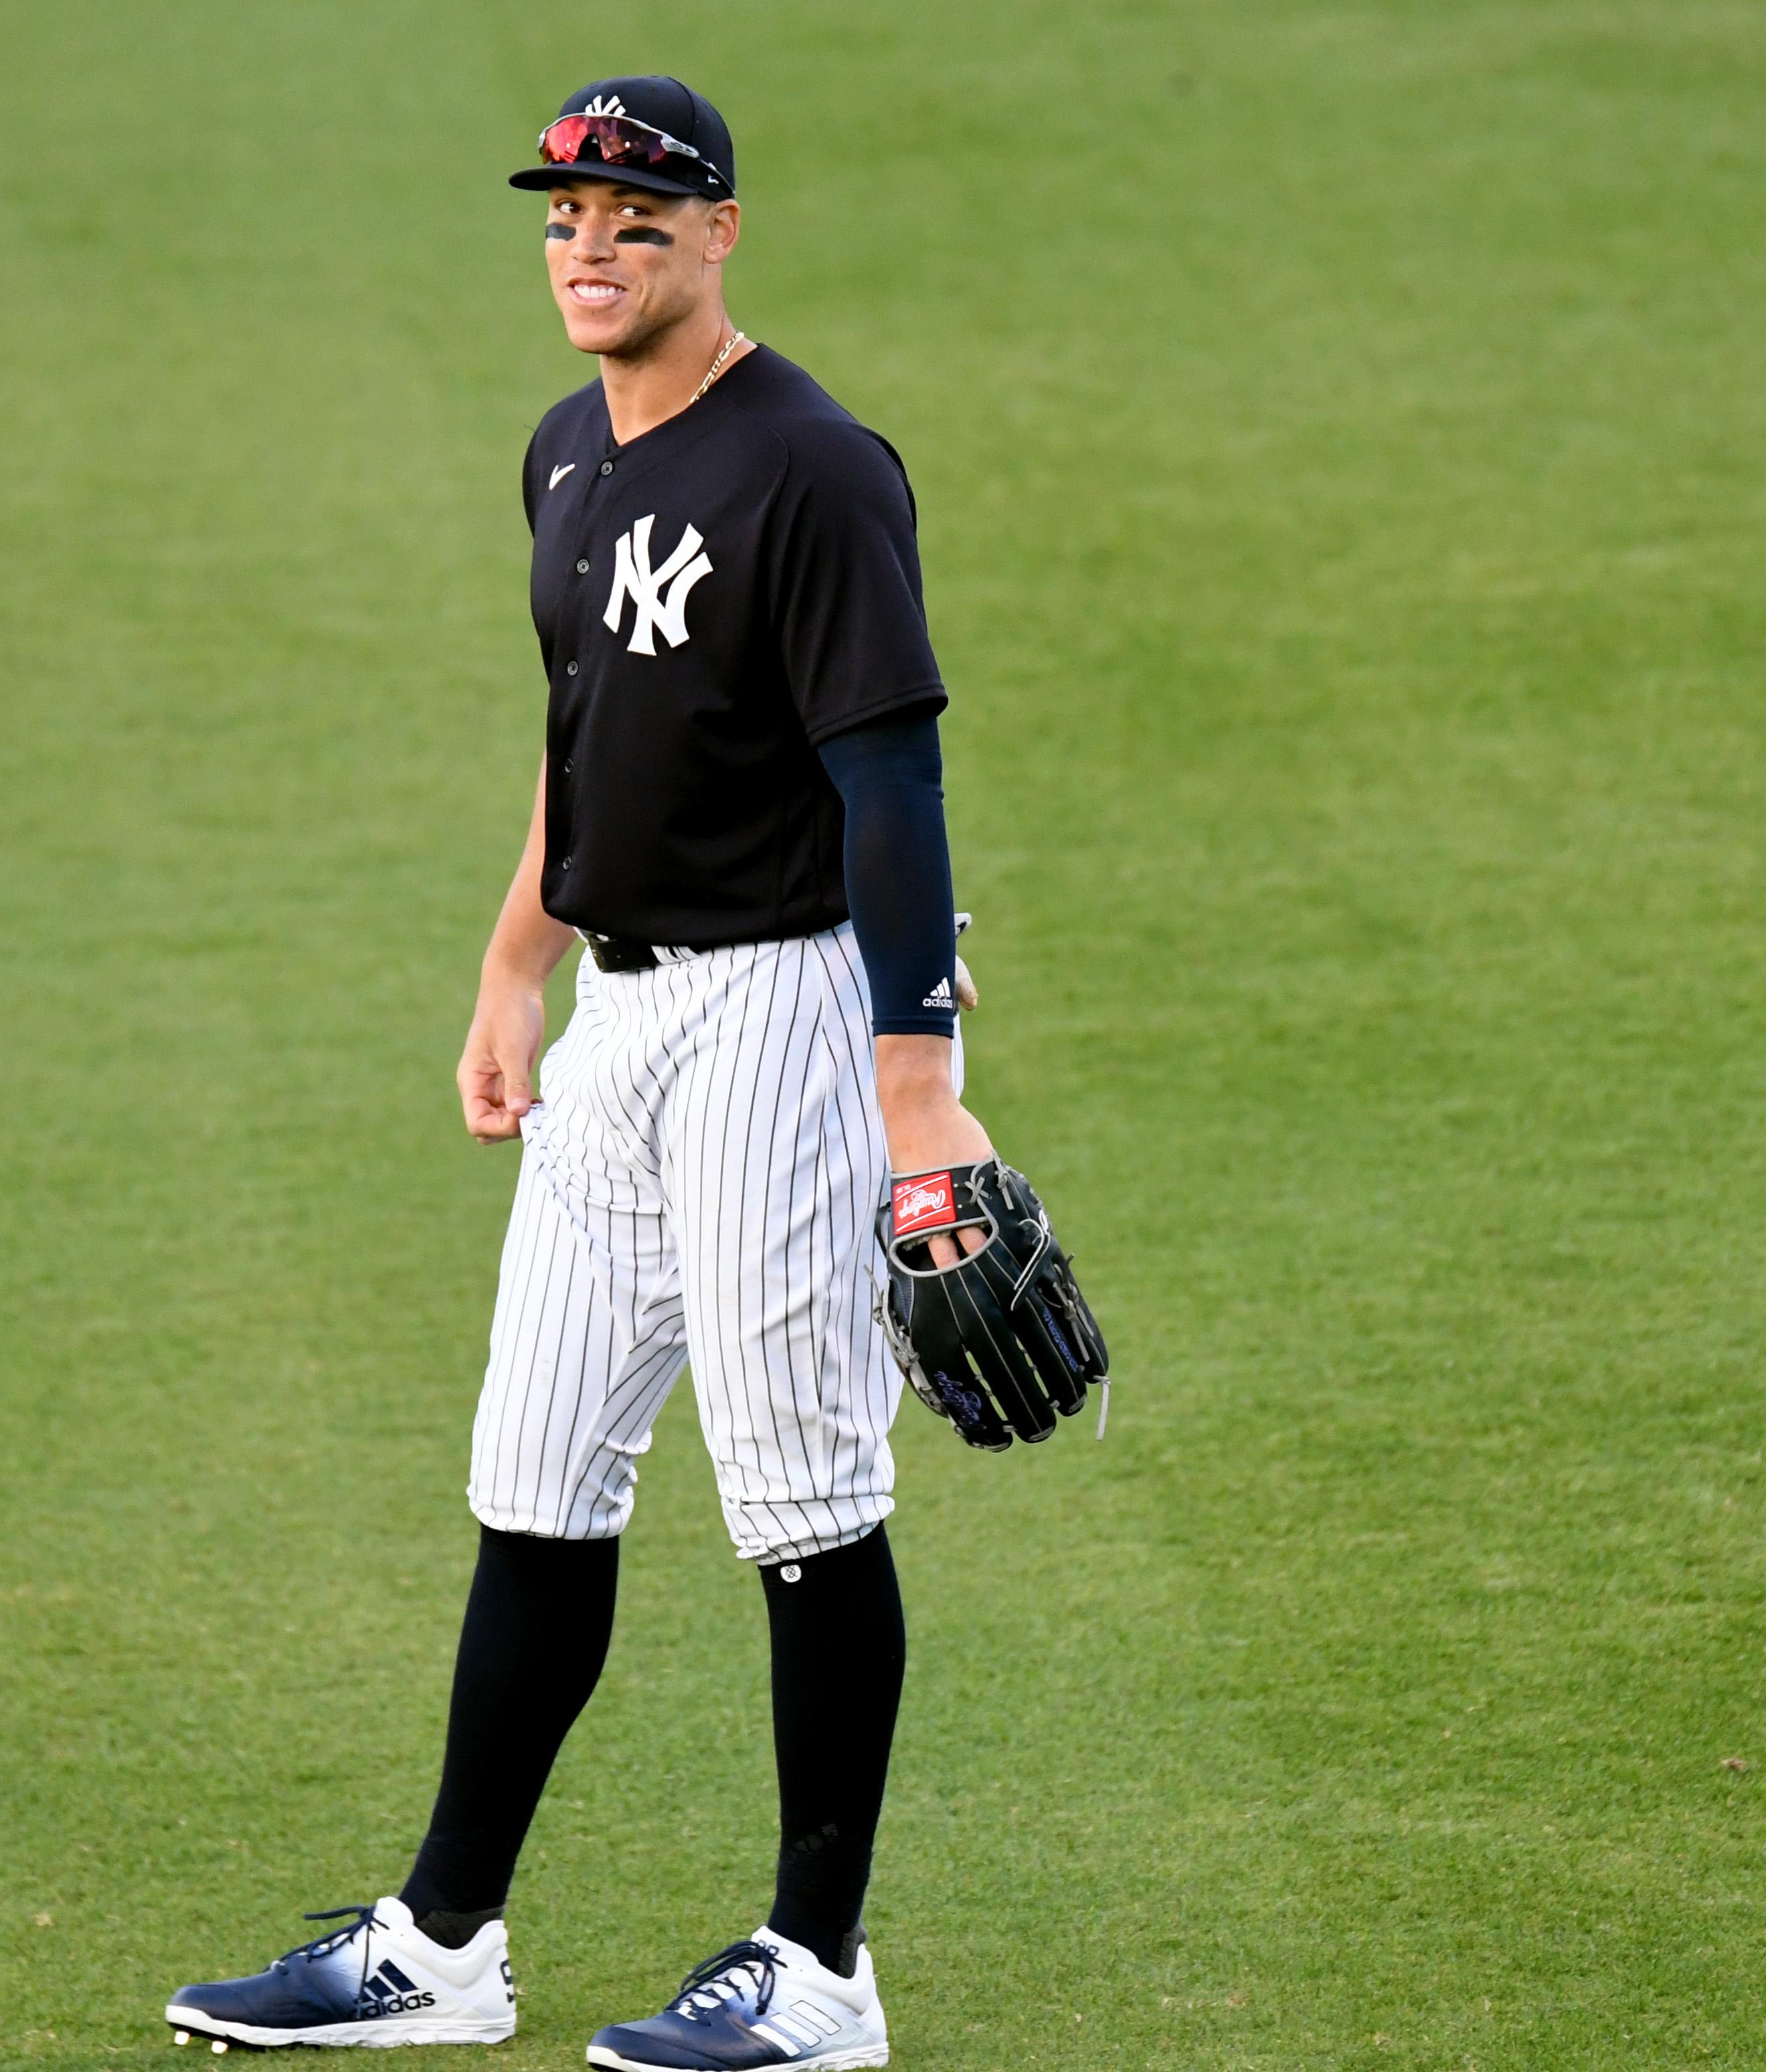 MLB: Philadelphia Phillies at New York Yankees